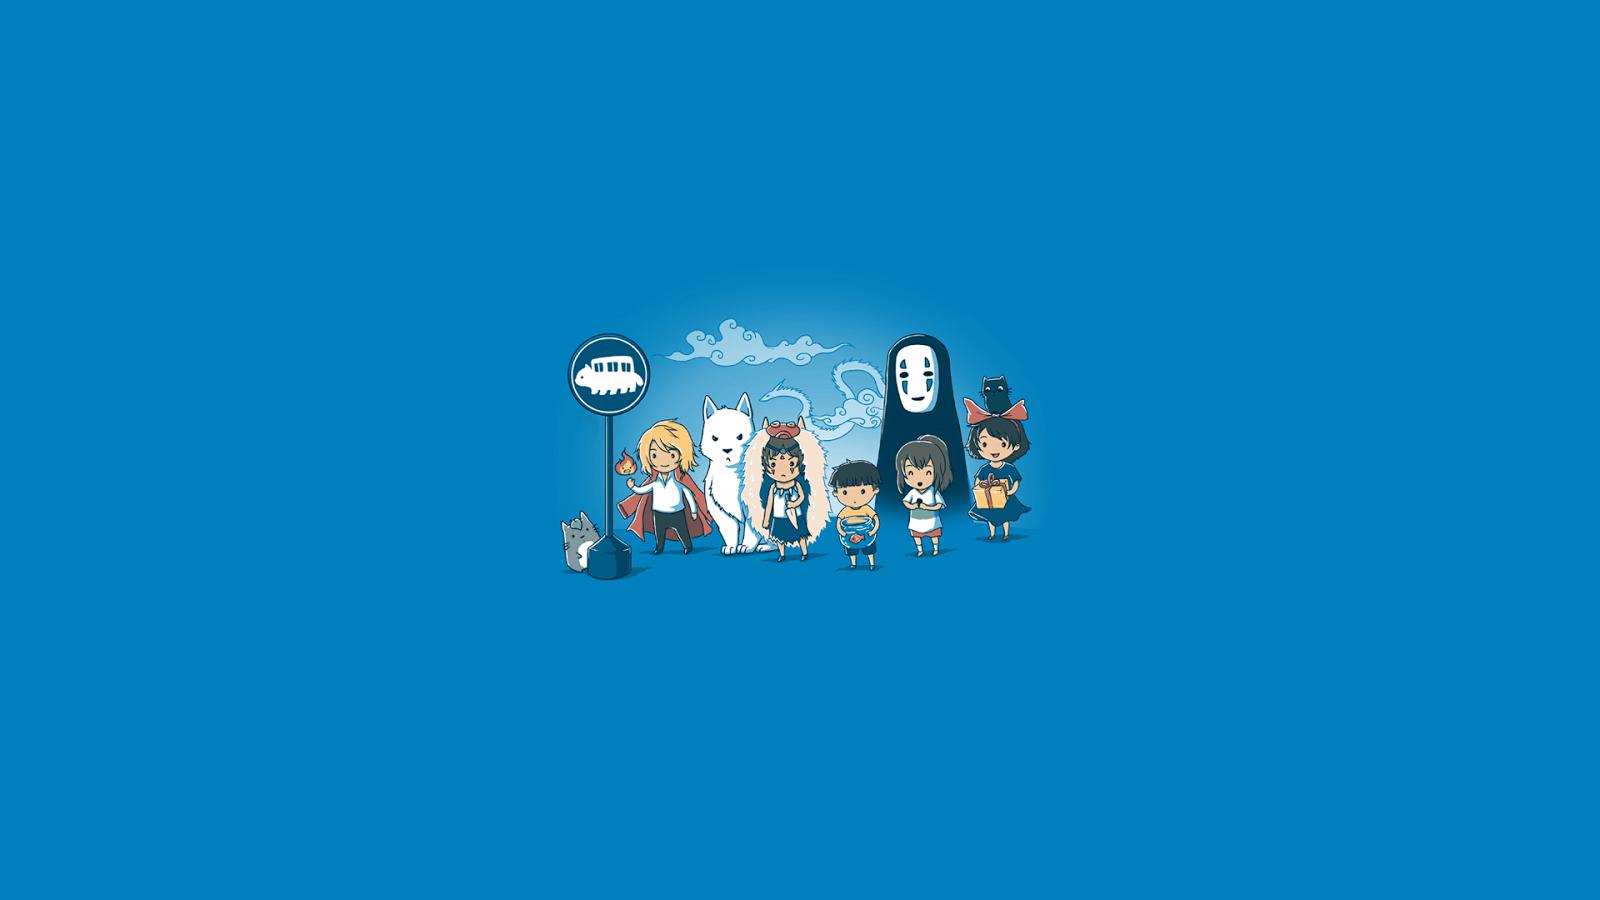 Minimalist Studio Ghibli Wallpapers Top Free Minimalist Studio Ghibli Backgrounds Wallpaperaccess